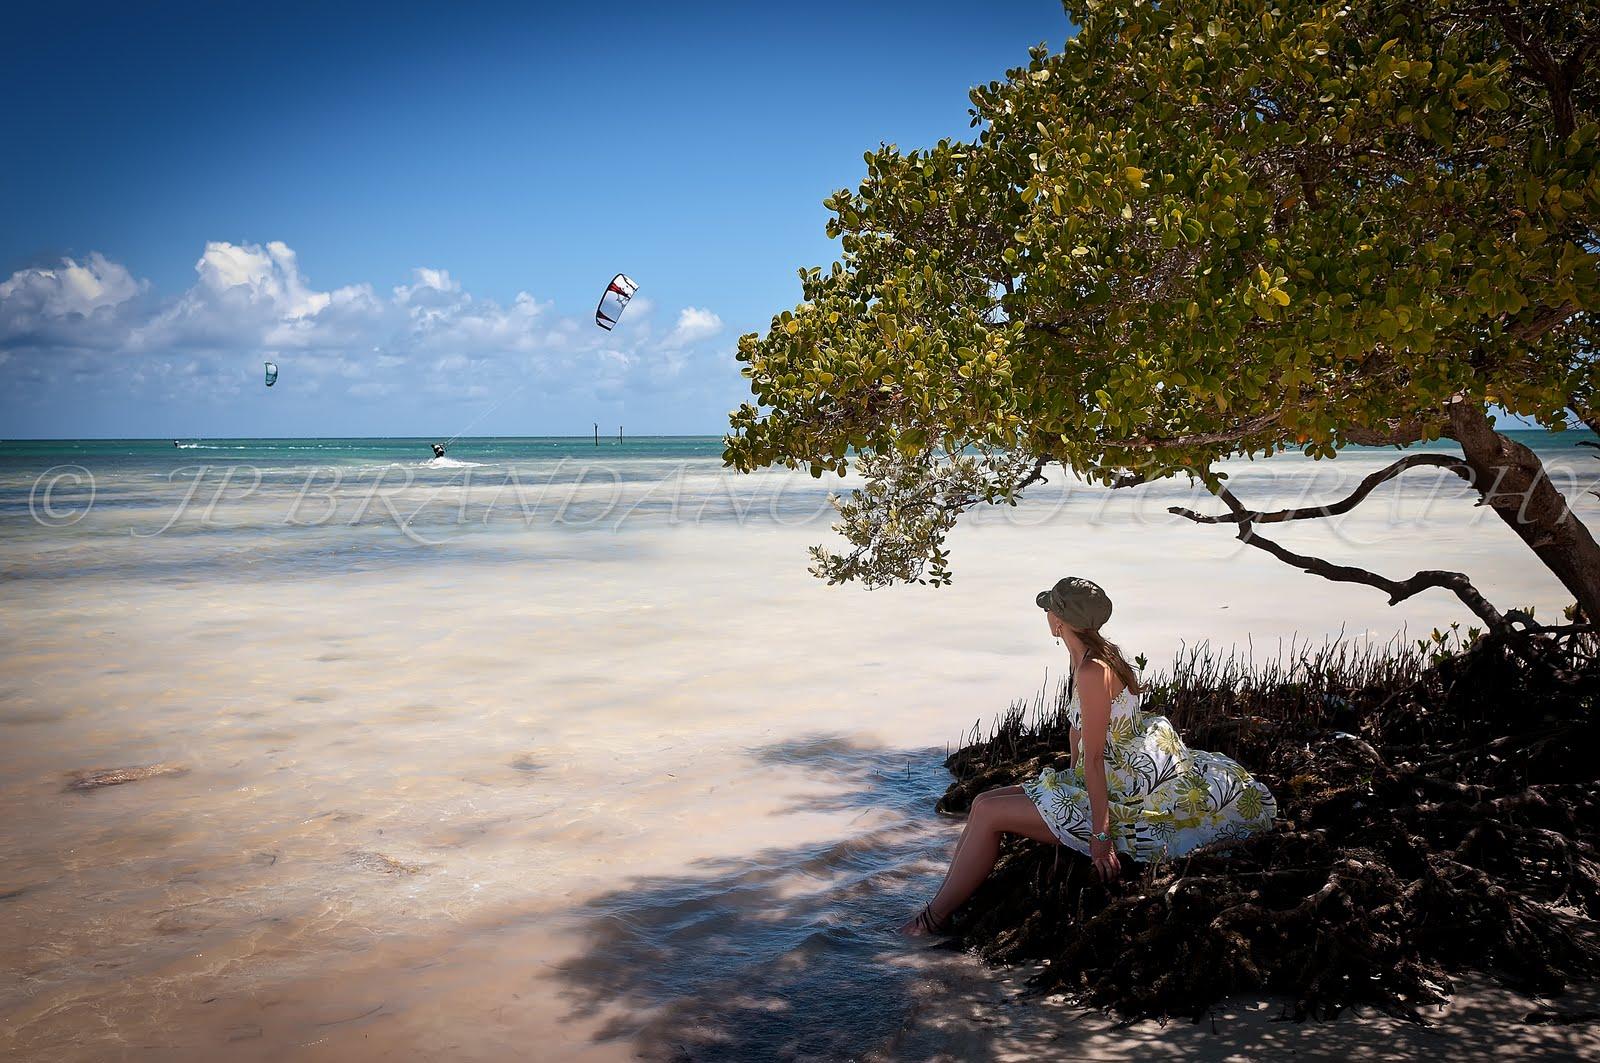 JP BRANDANO: FLORIDAS FINE ART PHOTOGRAPHERS: THE SPANISH